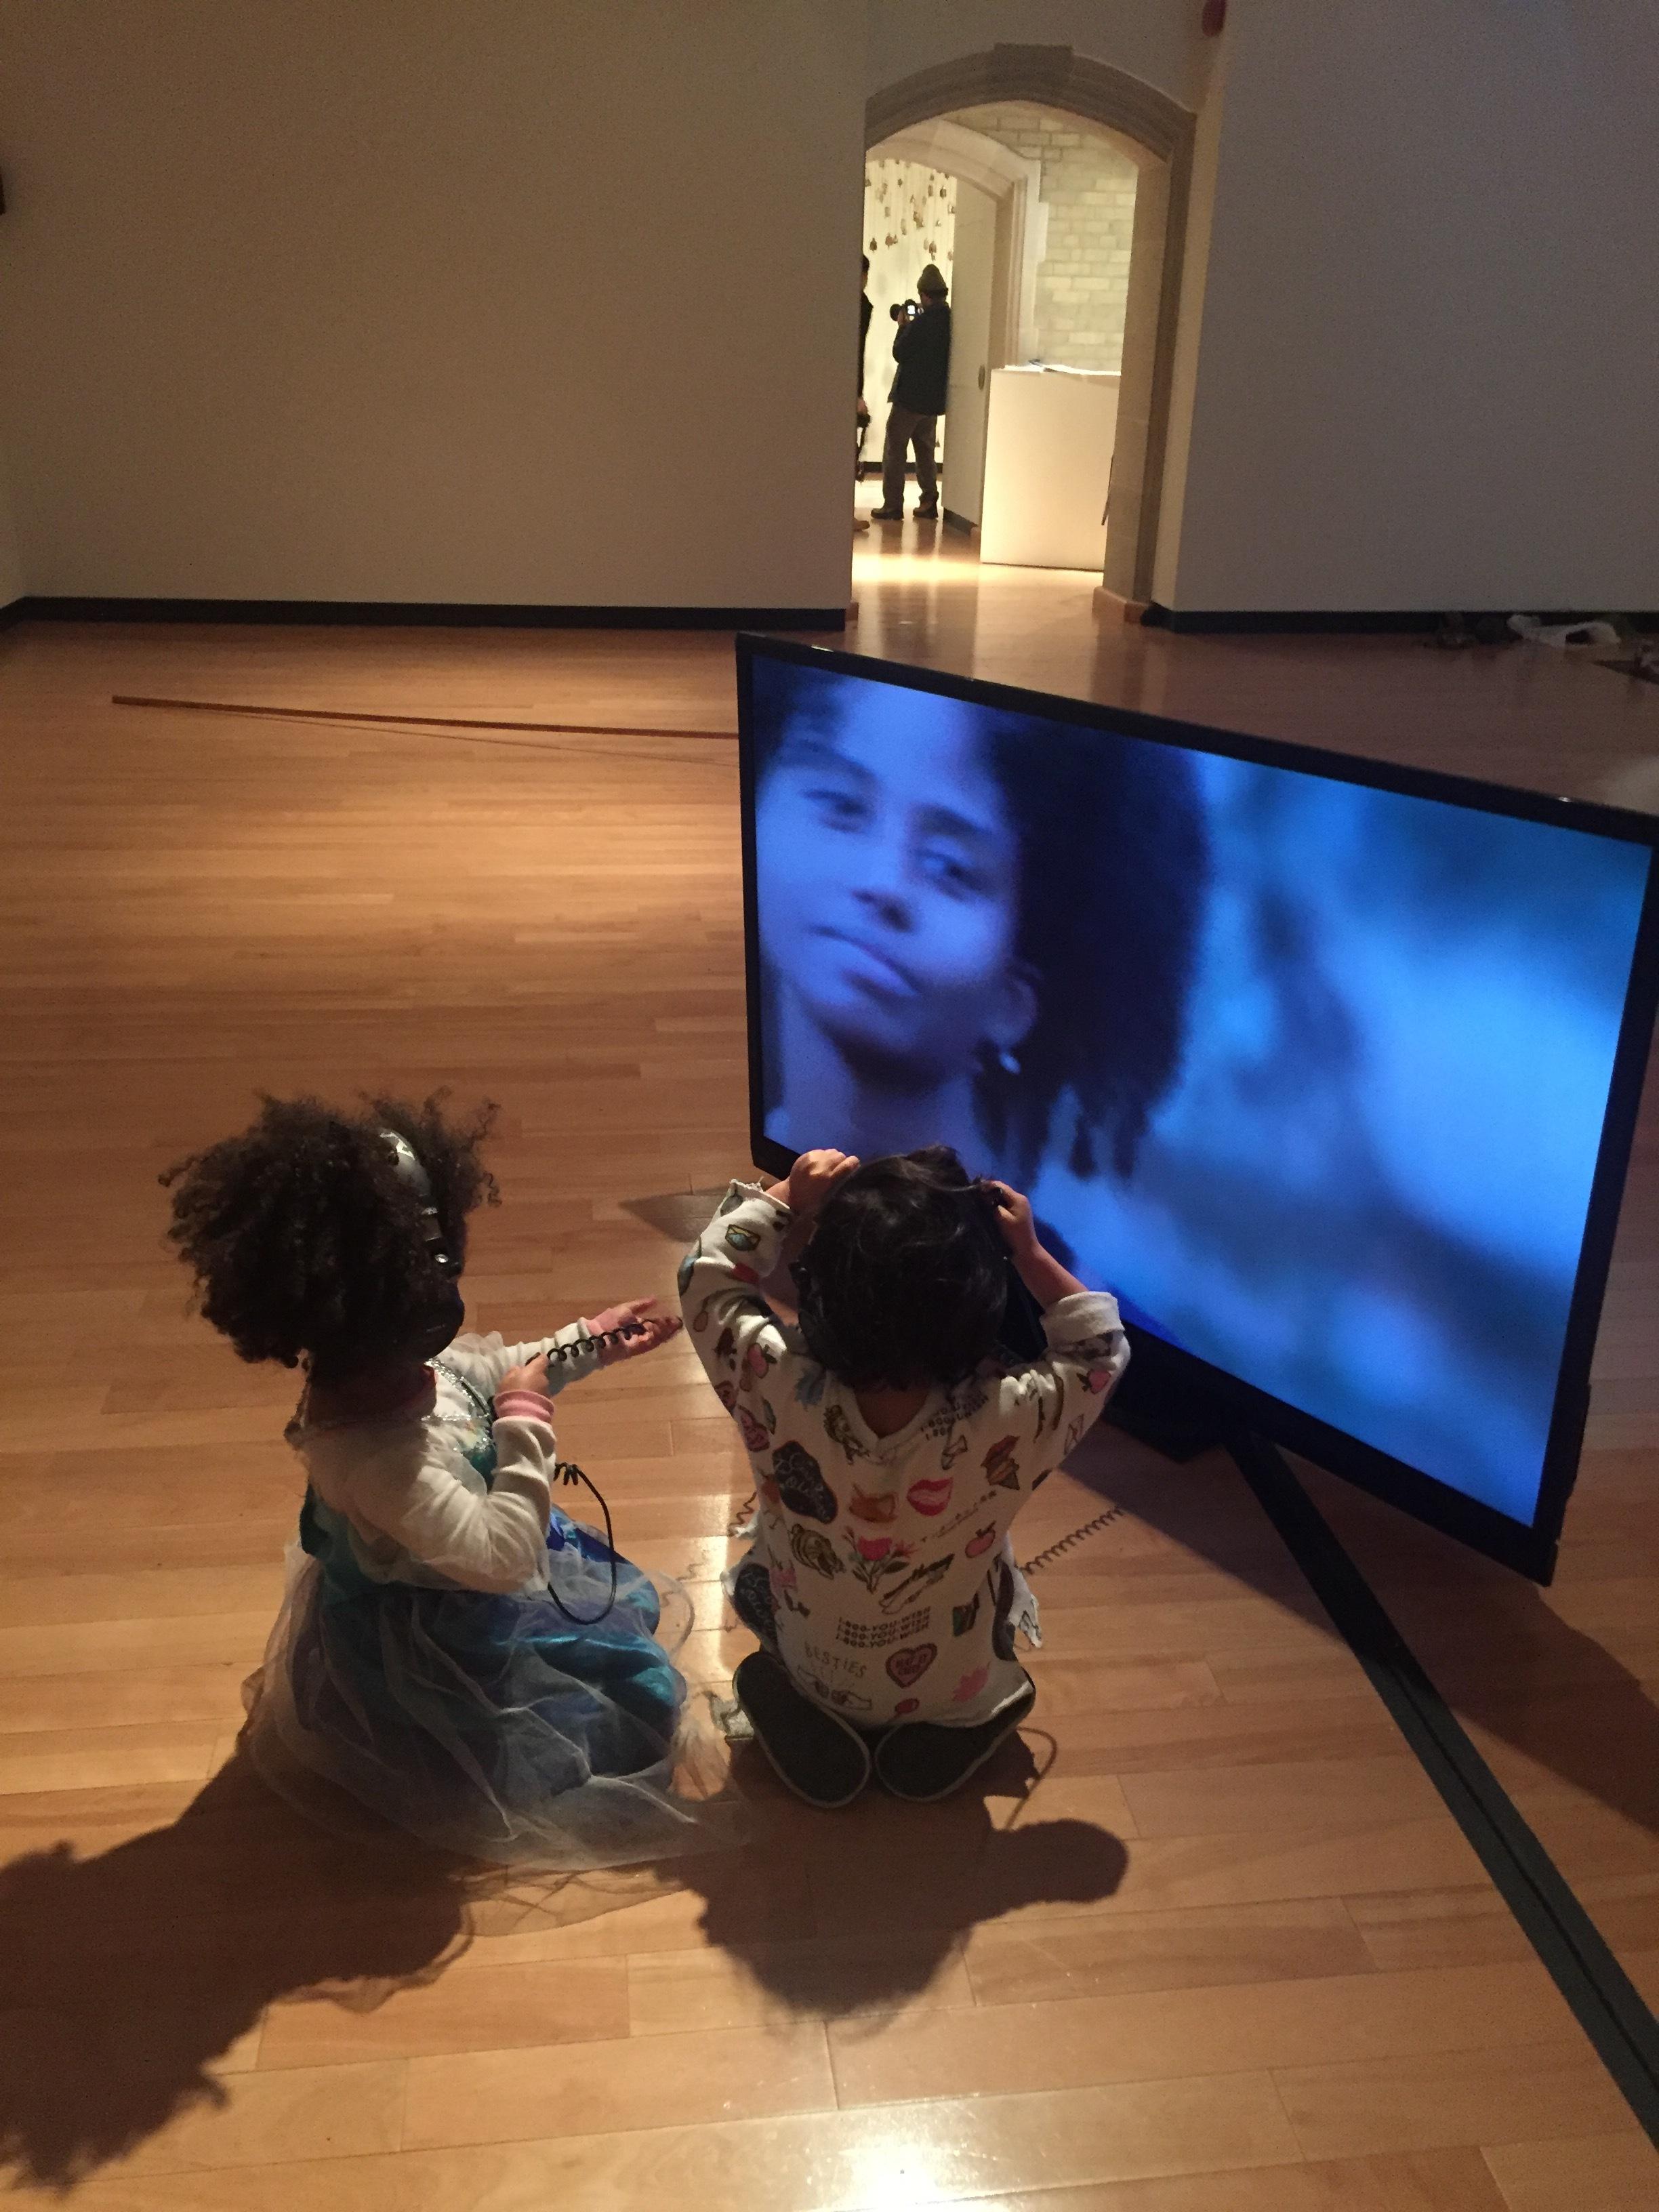 Moon in the 12th House  - 2017, Single-channel video, Director: Jessica Karuhanga, Cinematographer: Xin Liu, Editors: Serene Husni and Jessica Karuhanga, Performers: Ahlam Mohammed, Maandeeq Mohamed, and Kimberley Wint